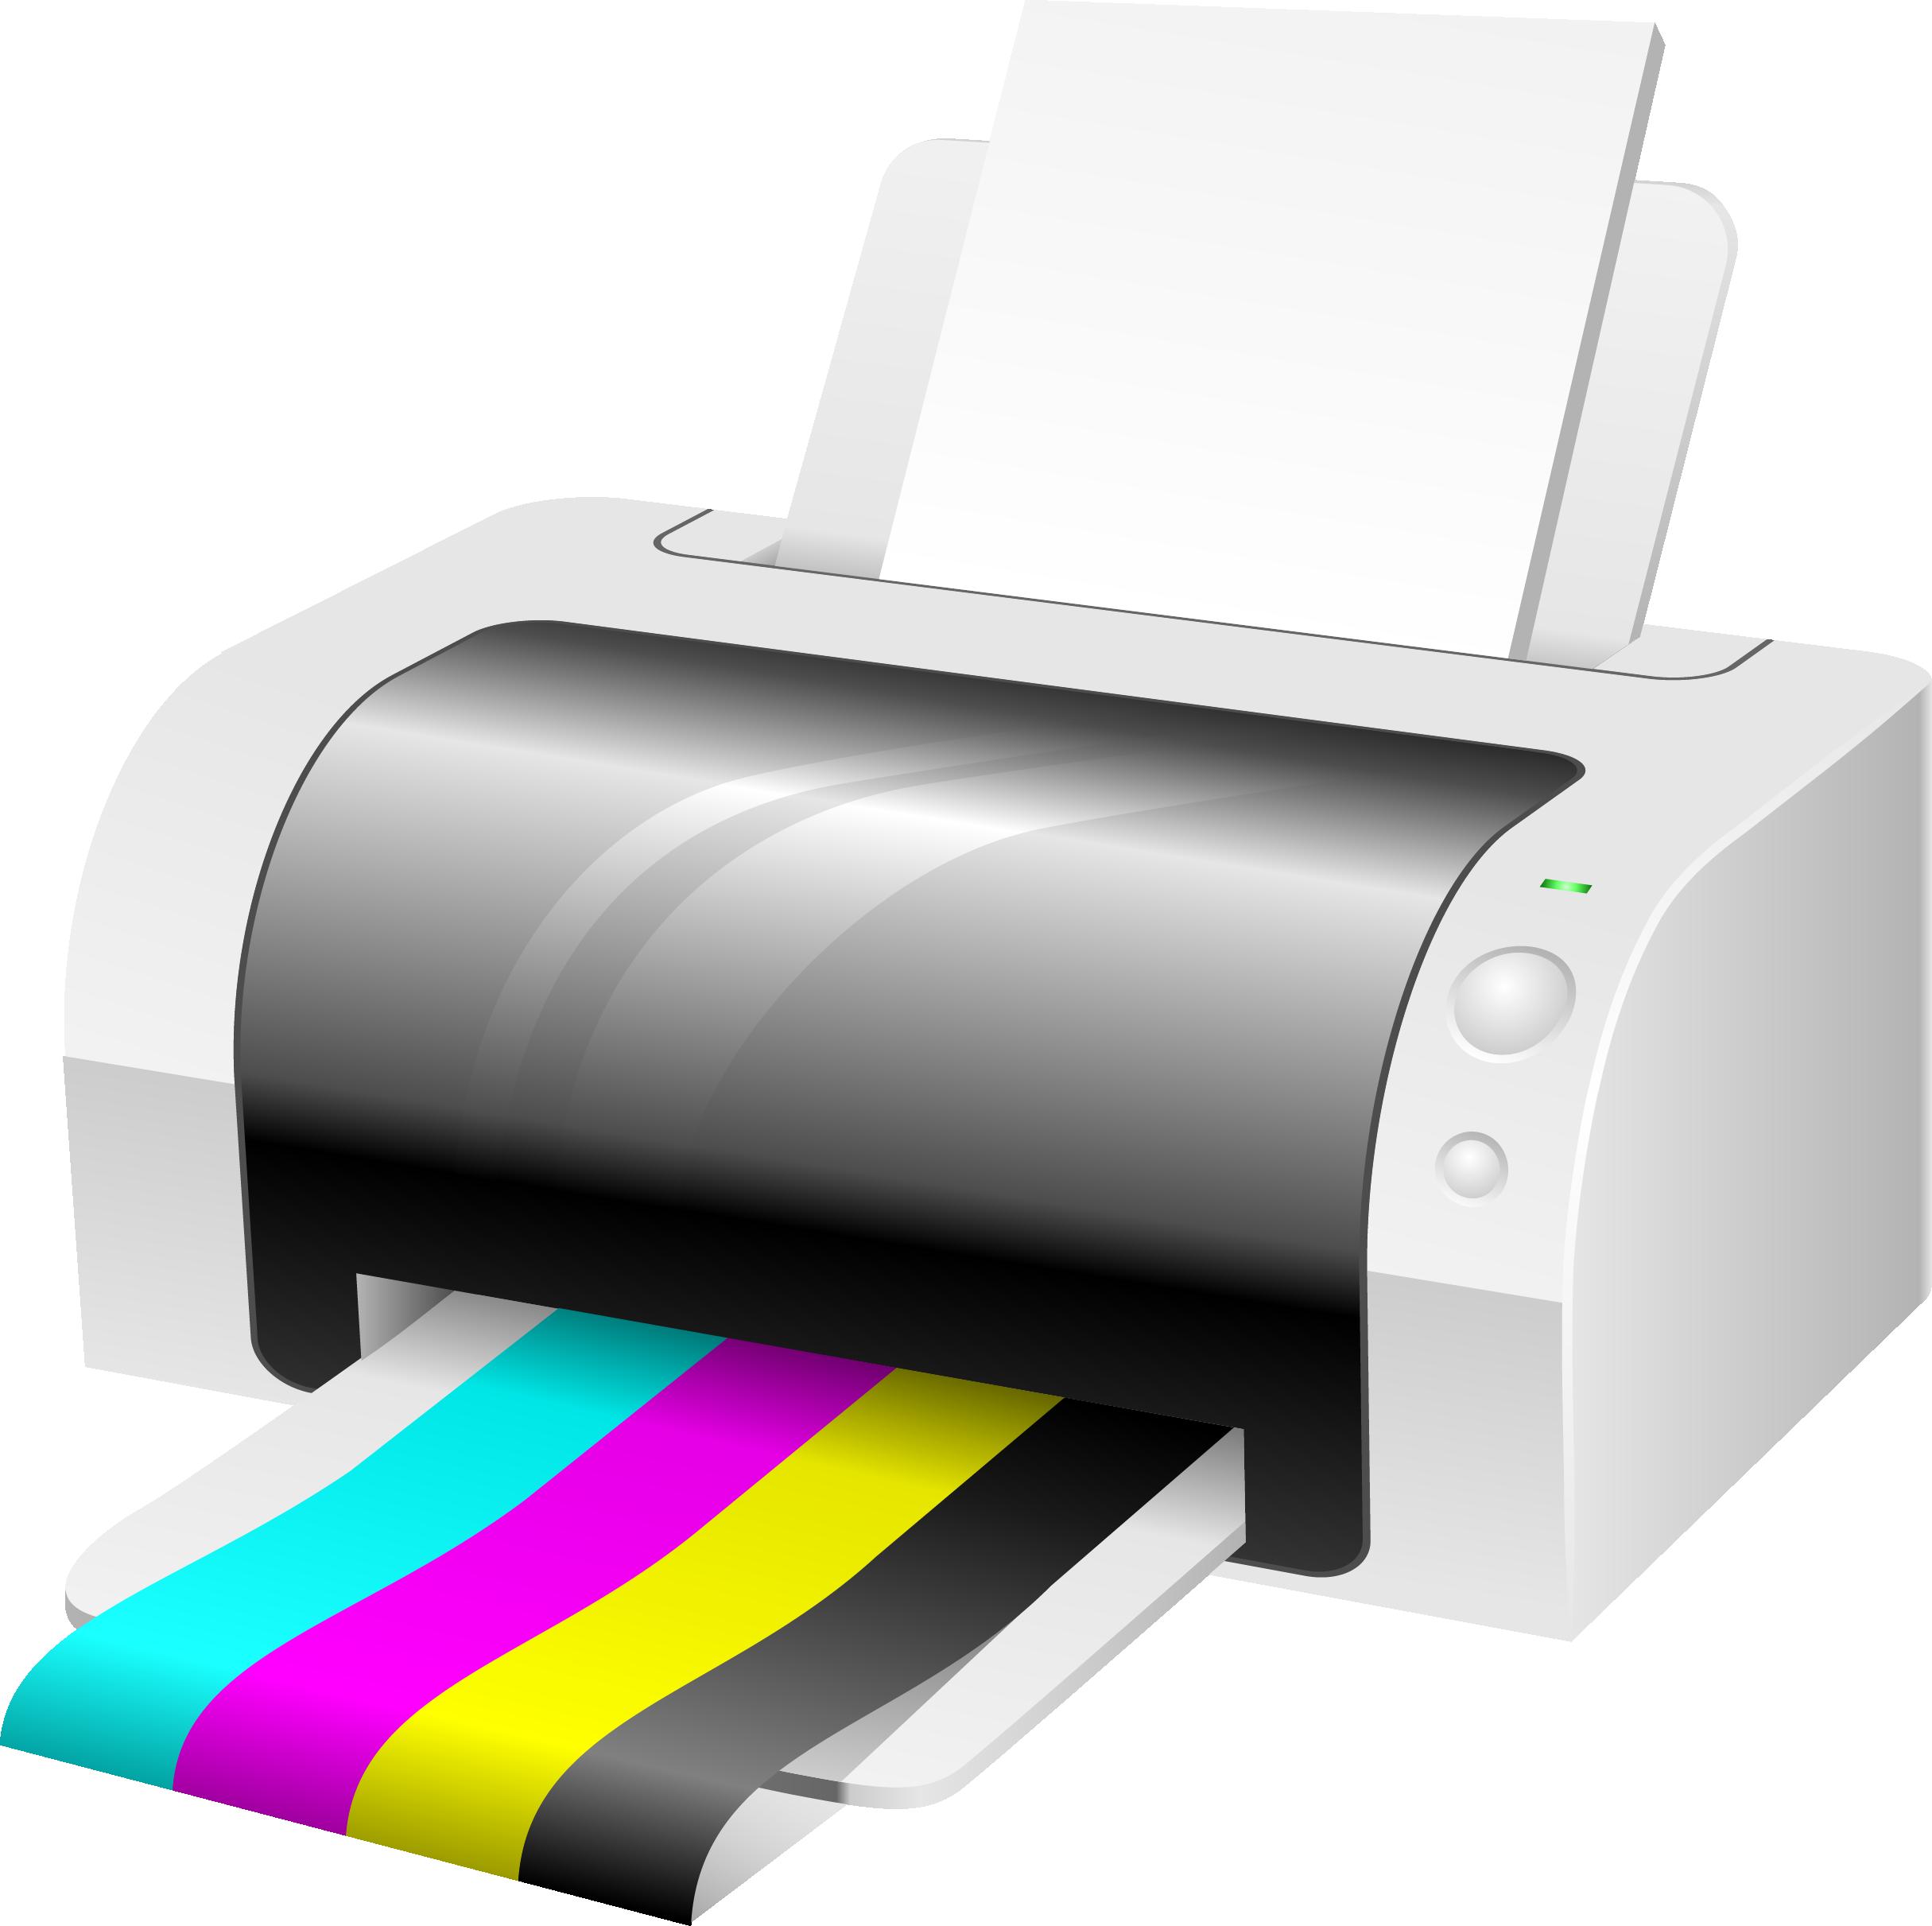 2430x2422 Printer Paper Cmyk Color Model Clip Art